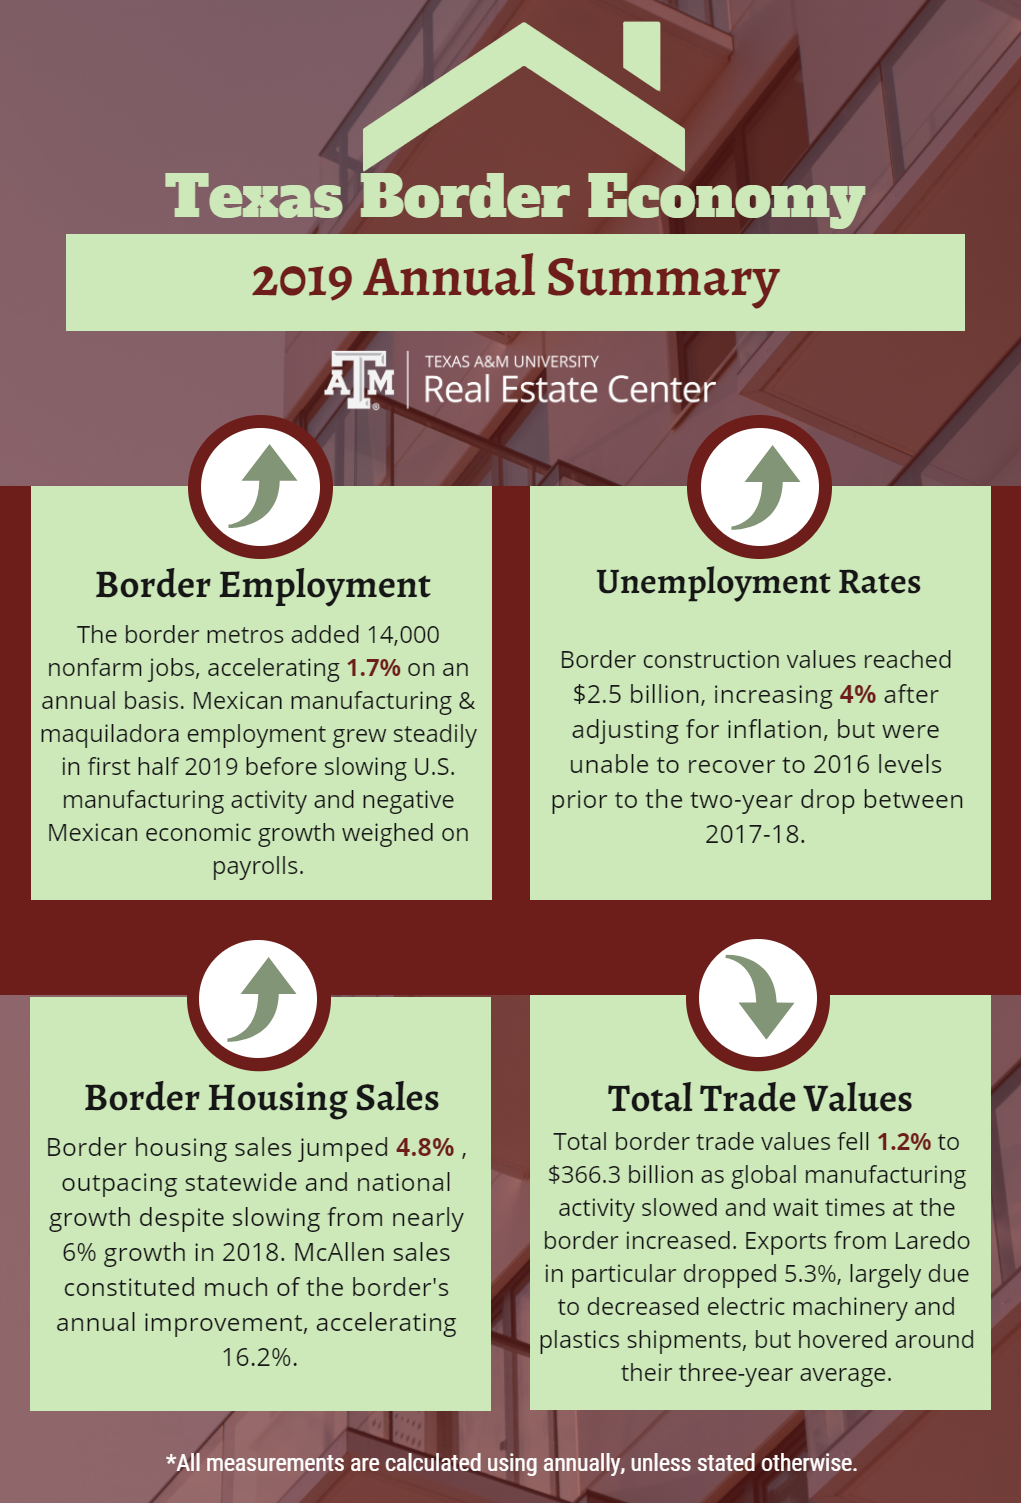 Border economy 2019 summary